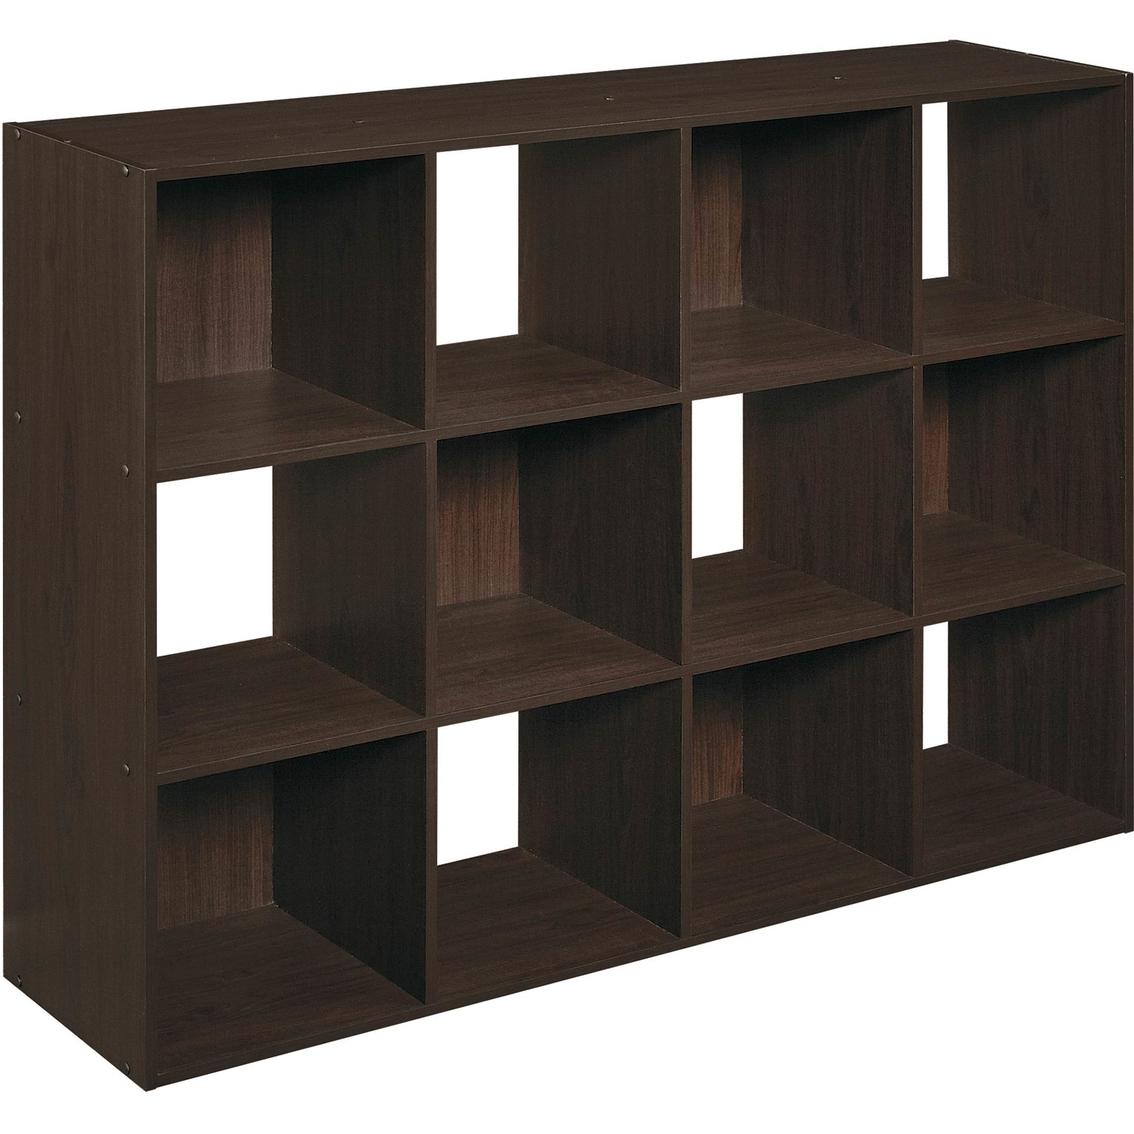 ClosetMaid 12 Cube Organizer